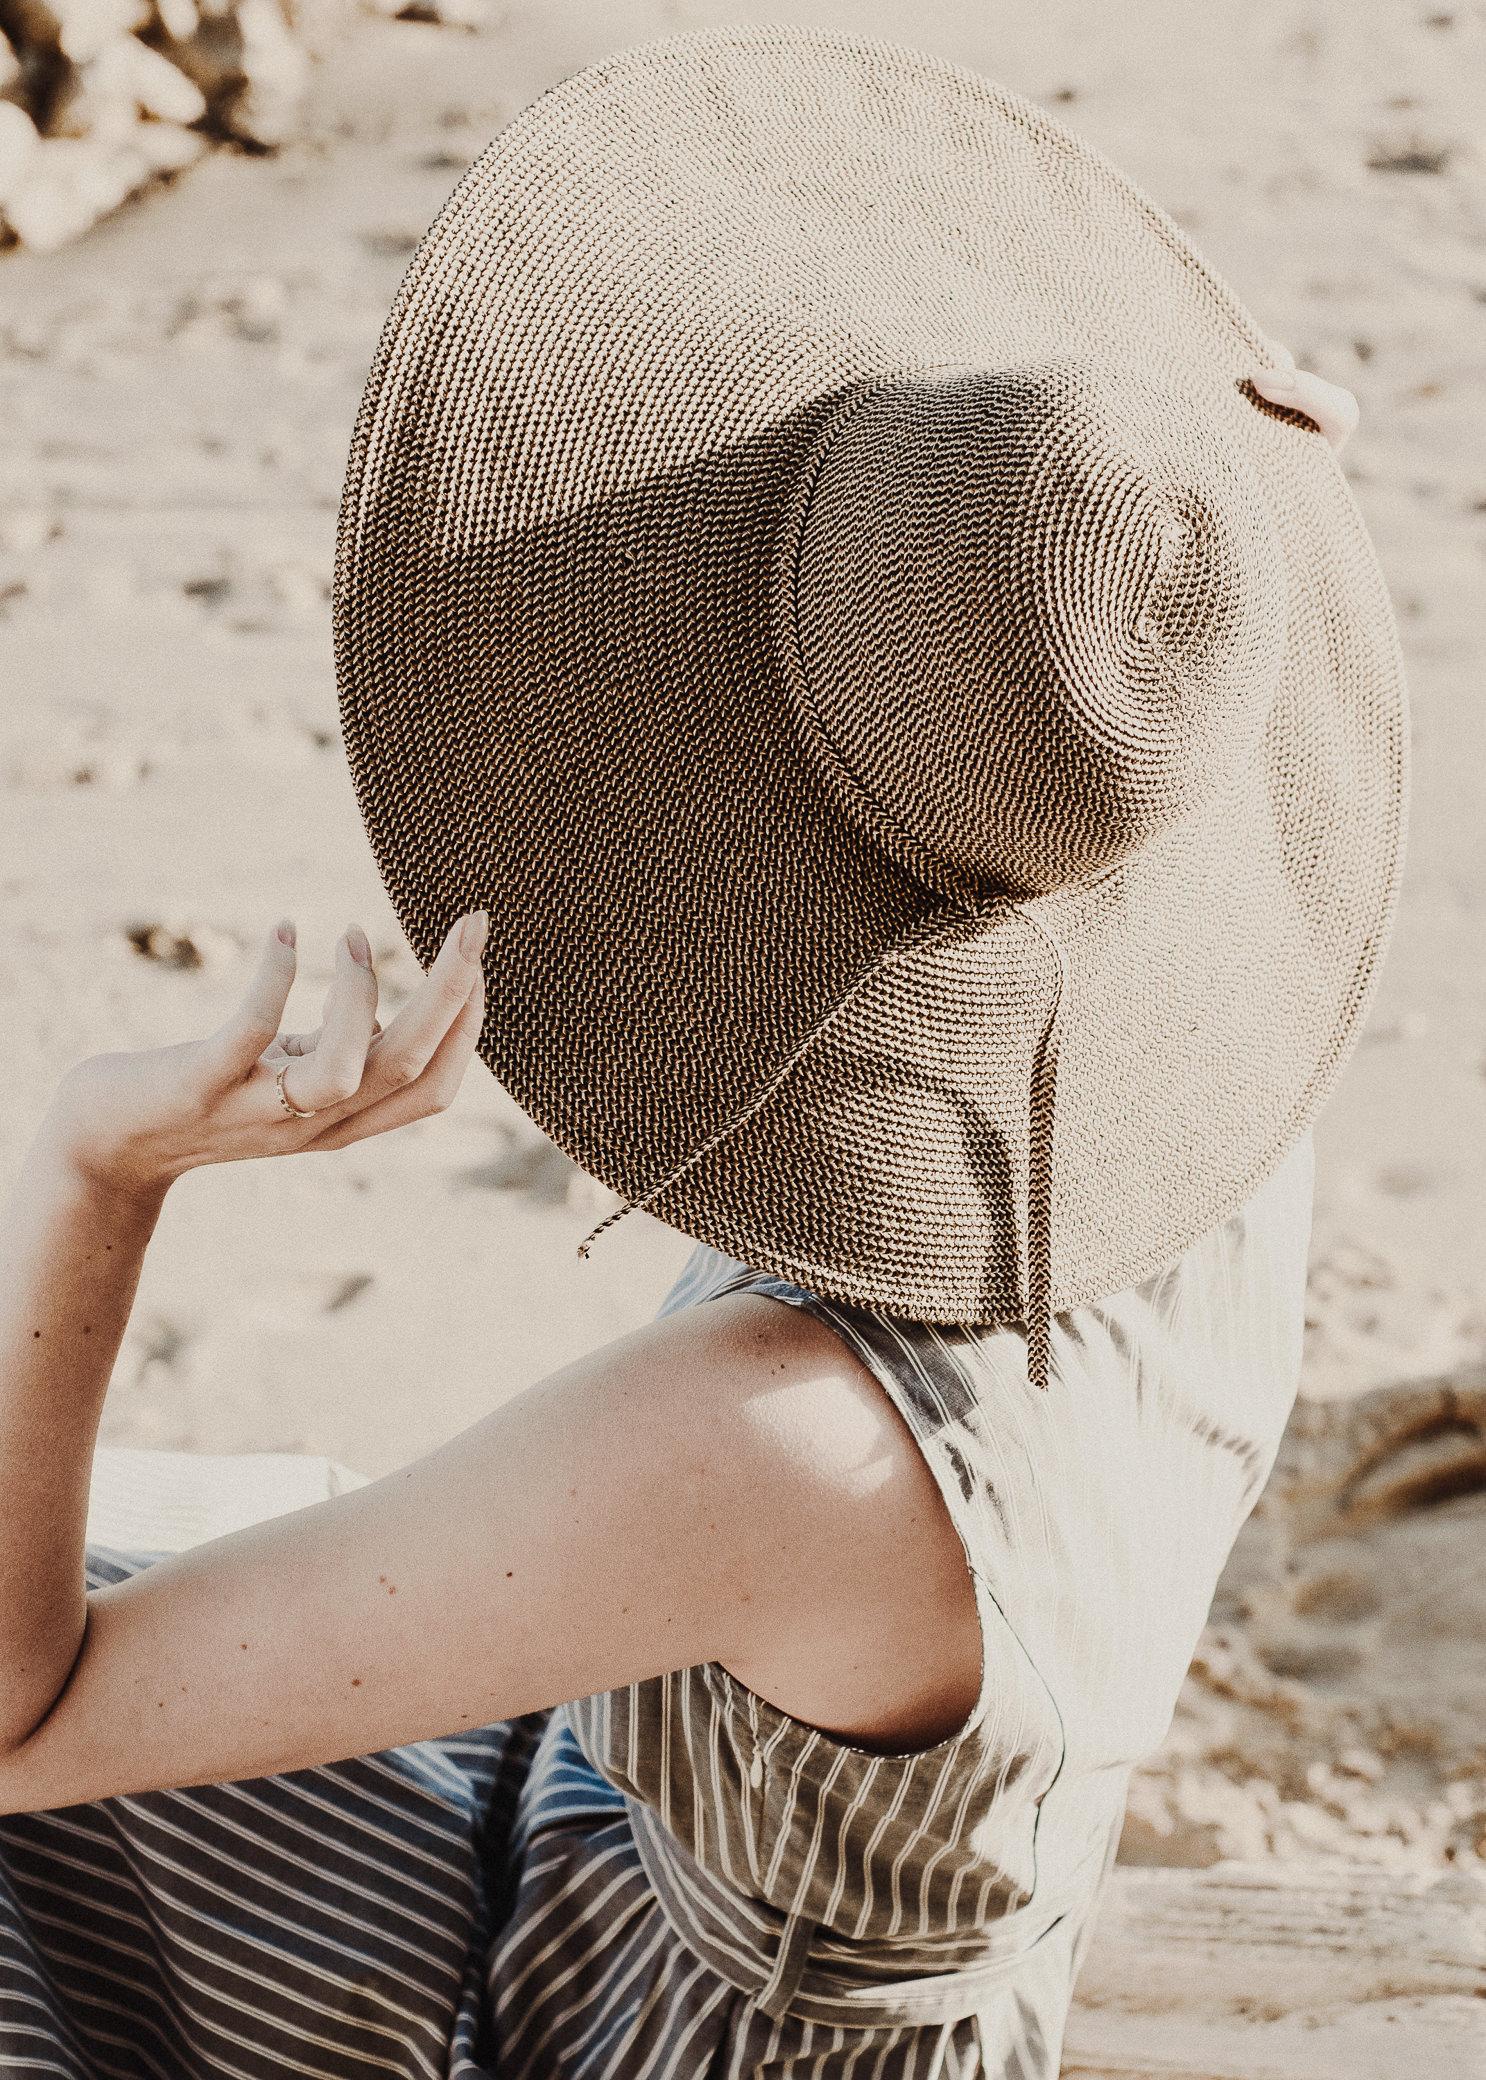 Santa Barbara Personal Branding Photographer Beach Portrait Miranda Kelton Photography